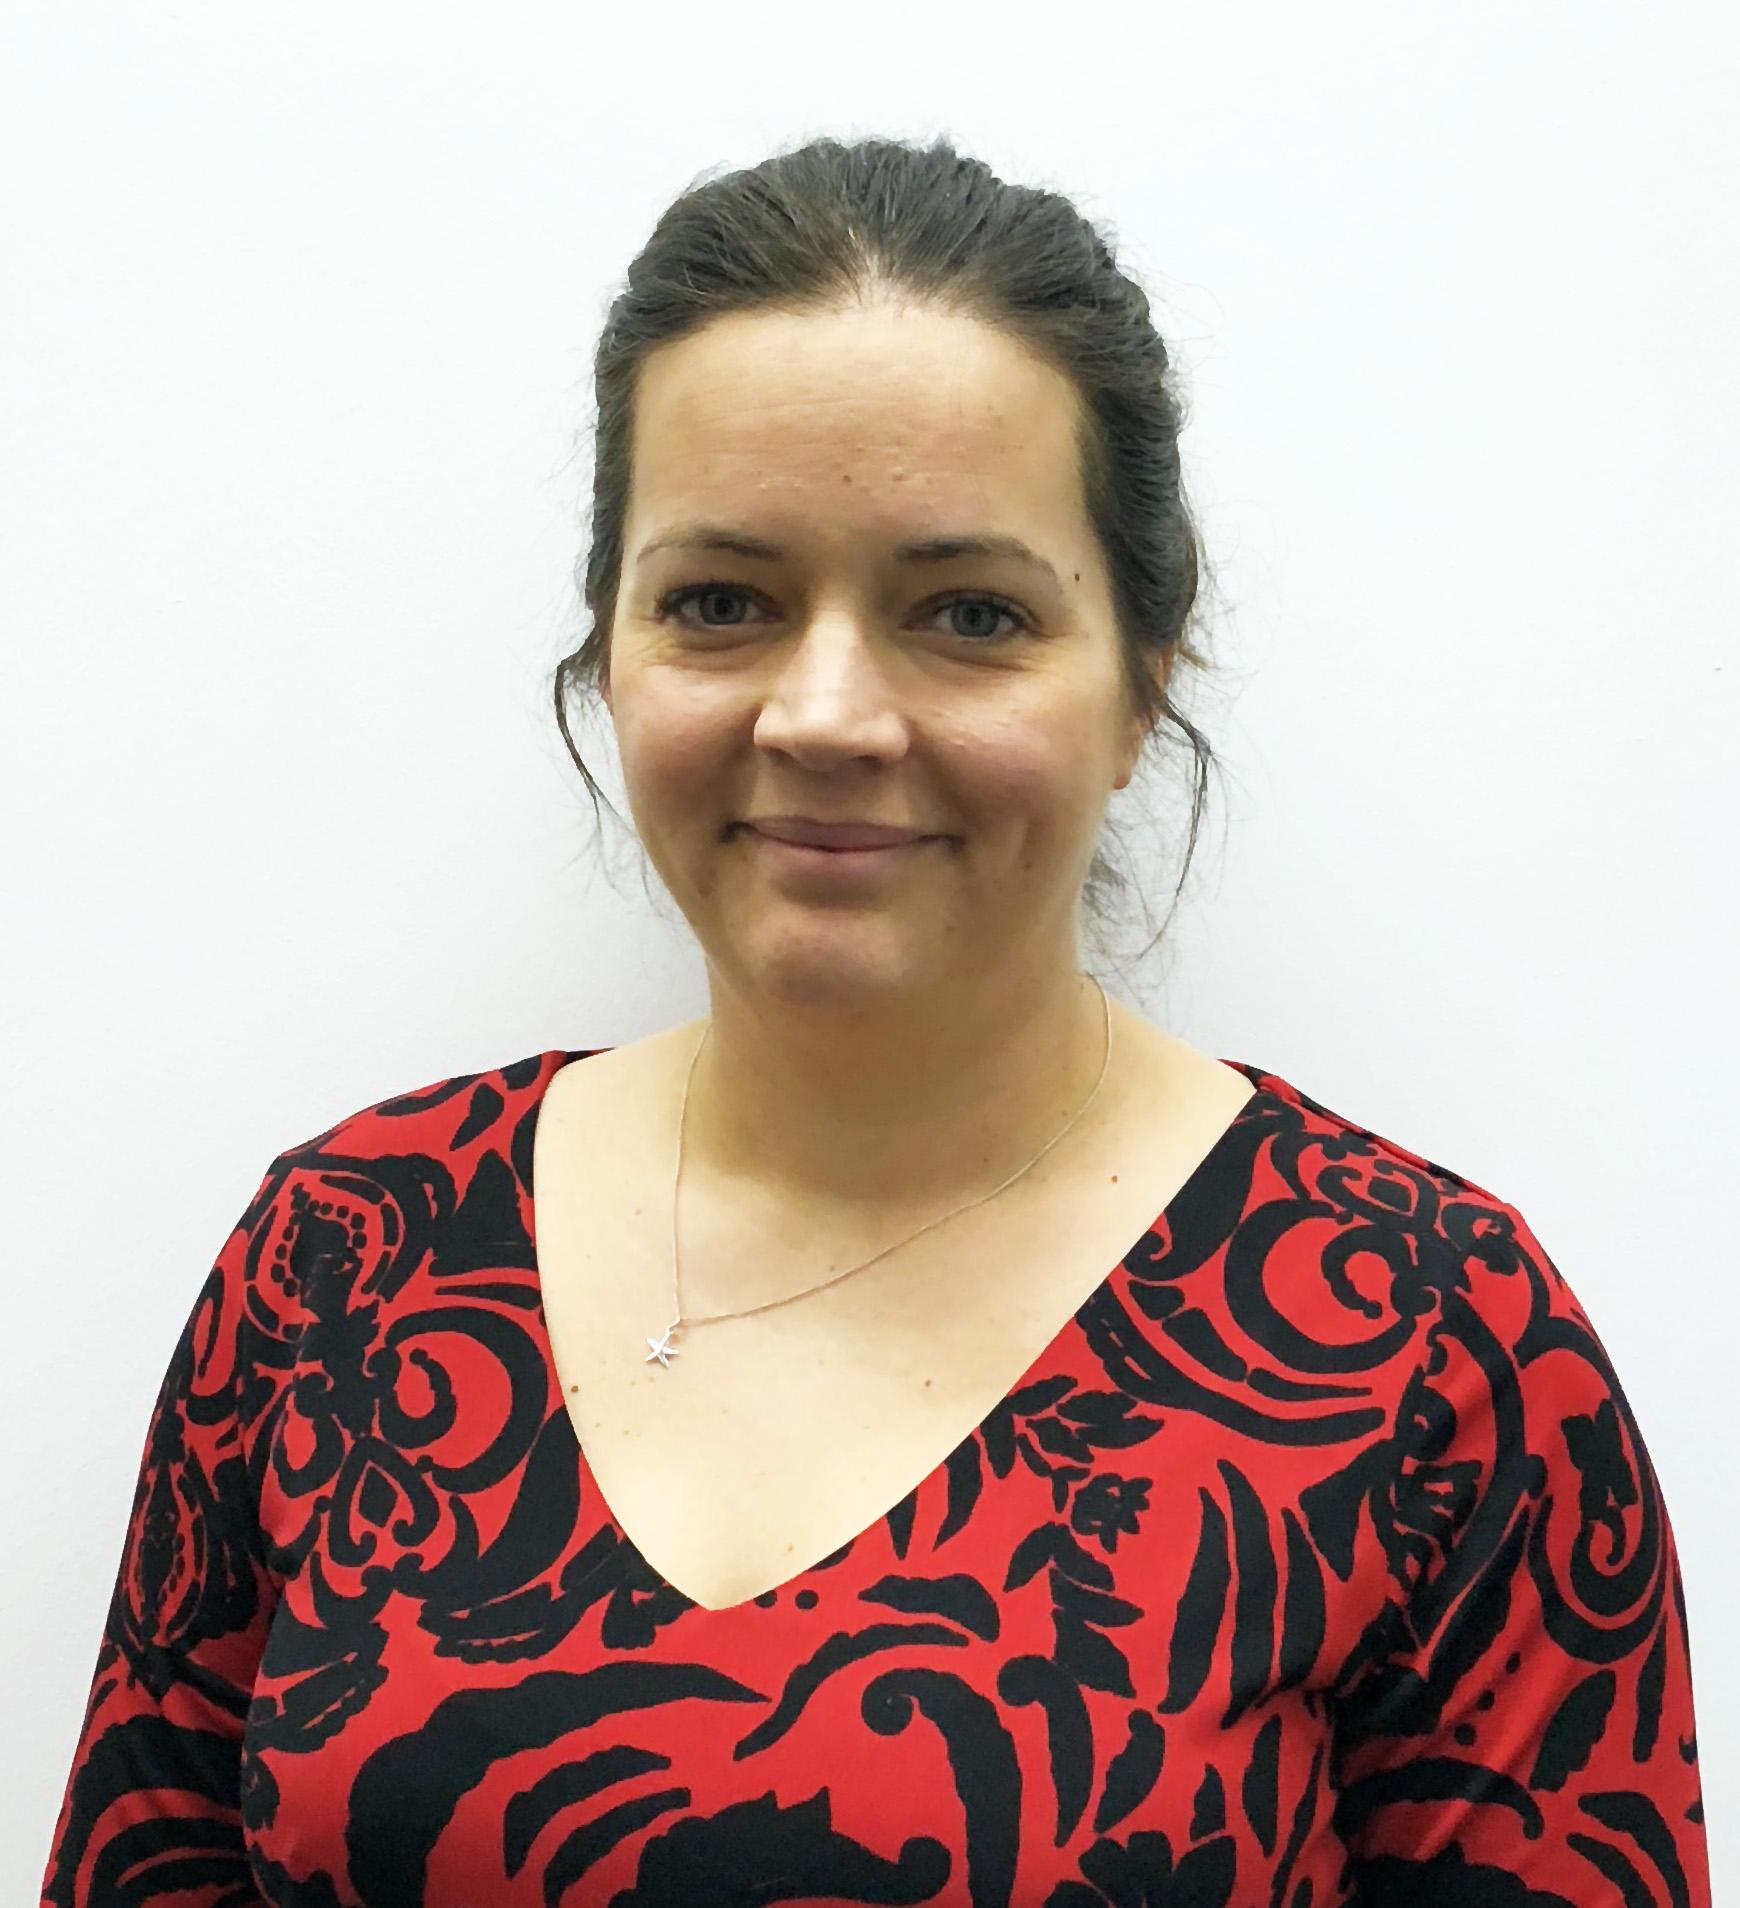 Naomi Bartholemew Miller